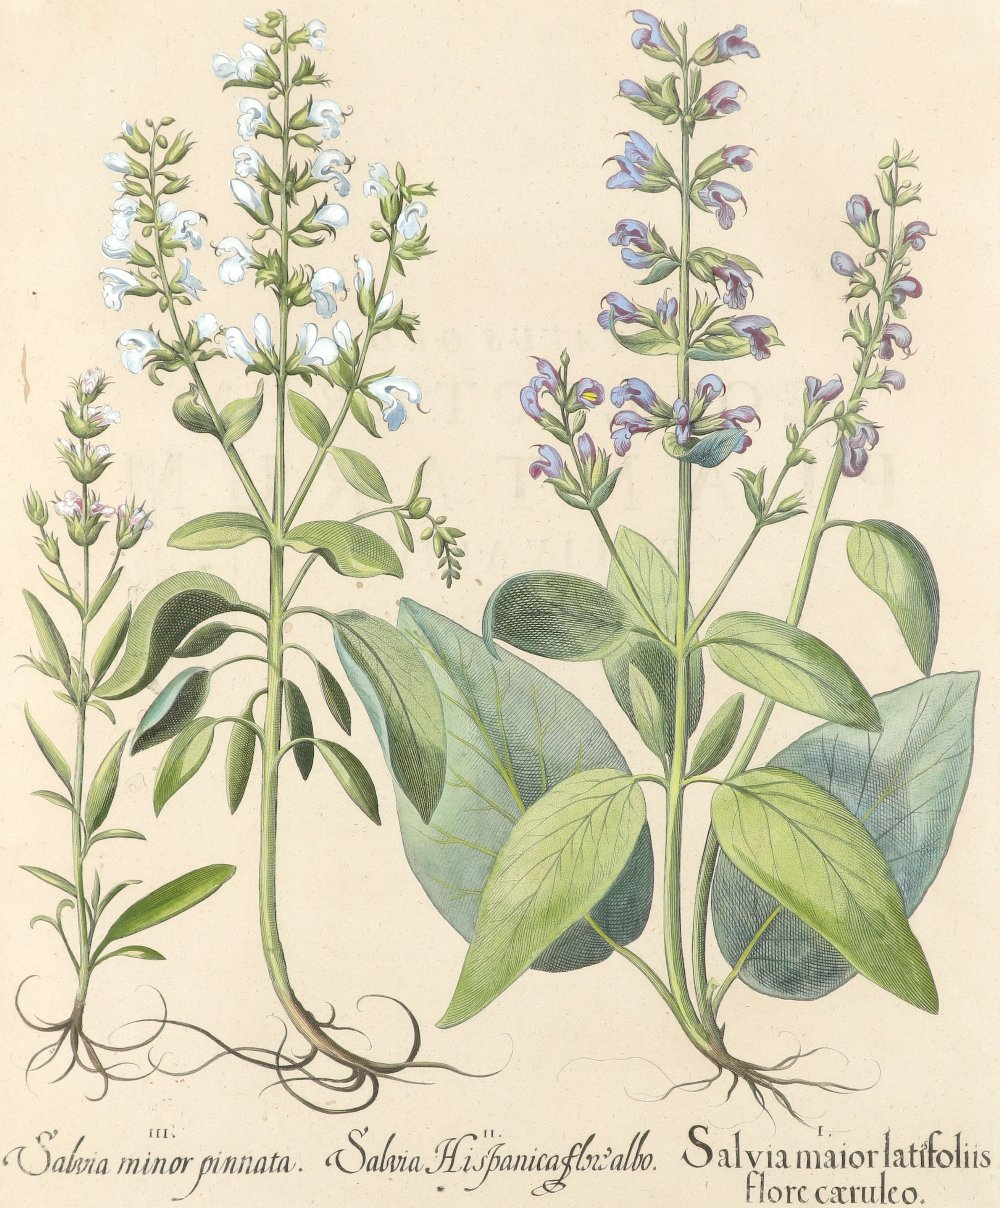 After Basilius Besler Poma flore multiplici; Aquilegia stellata flore vio laceo; Cytisus - Image 28 of 36